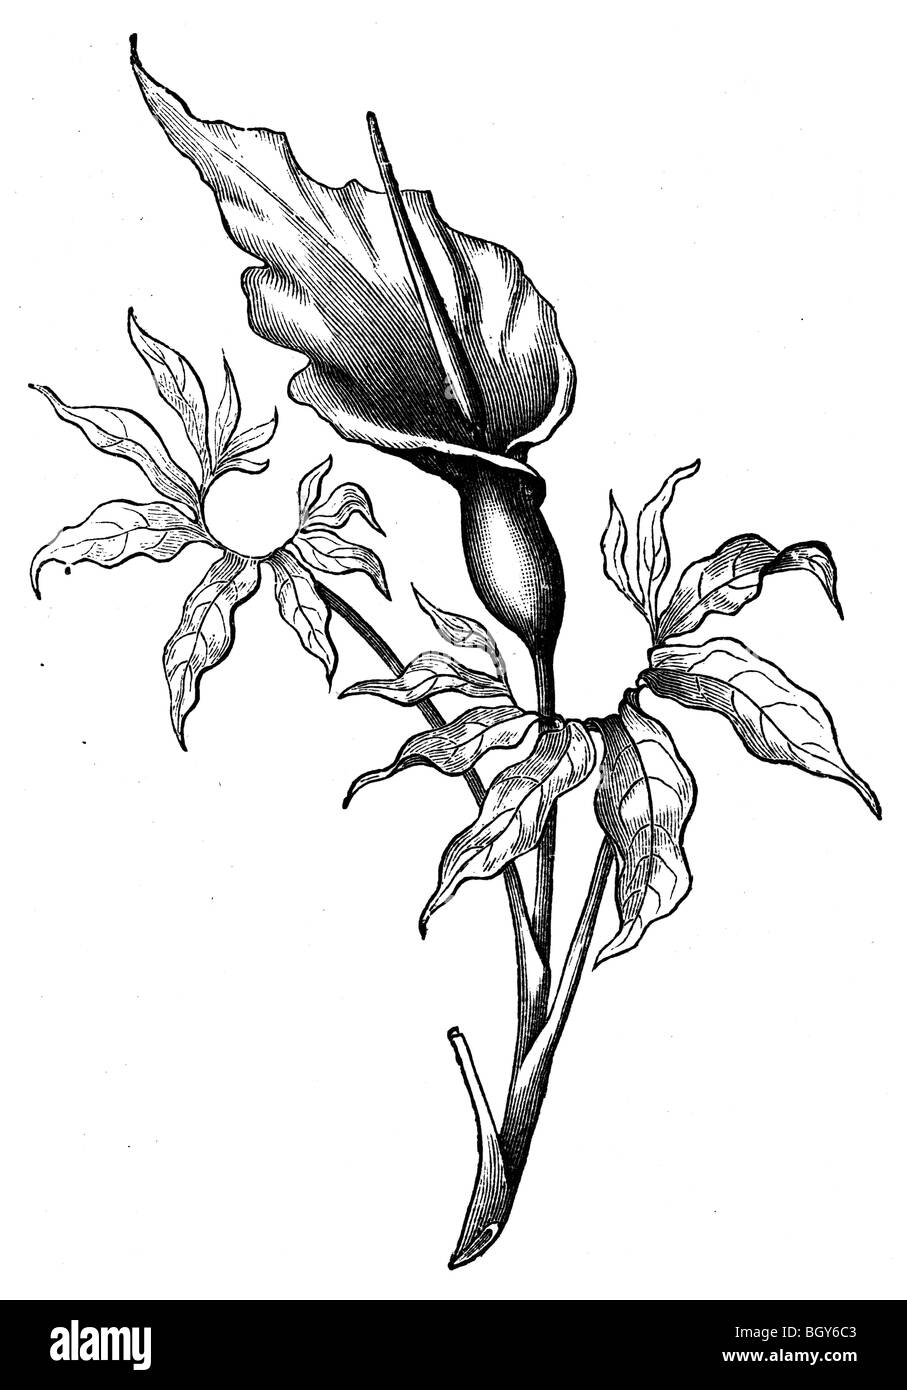 Poison plant, Calla - Stock Image